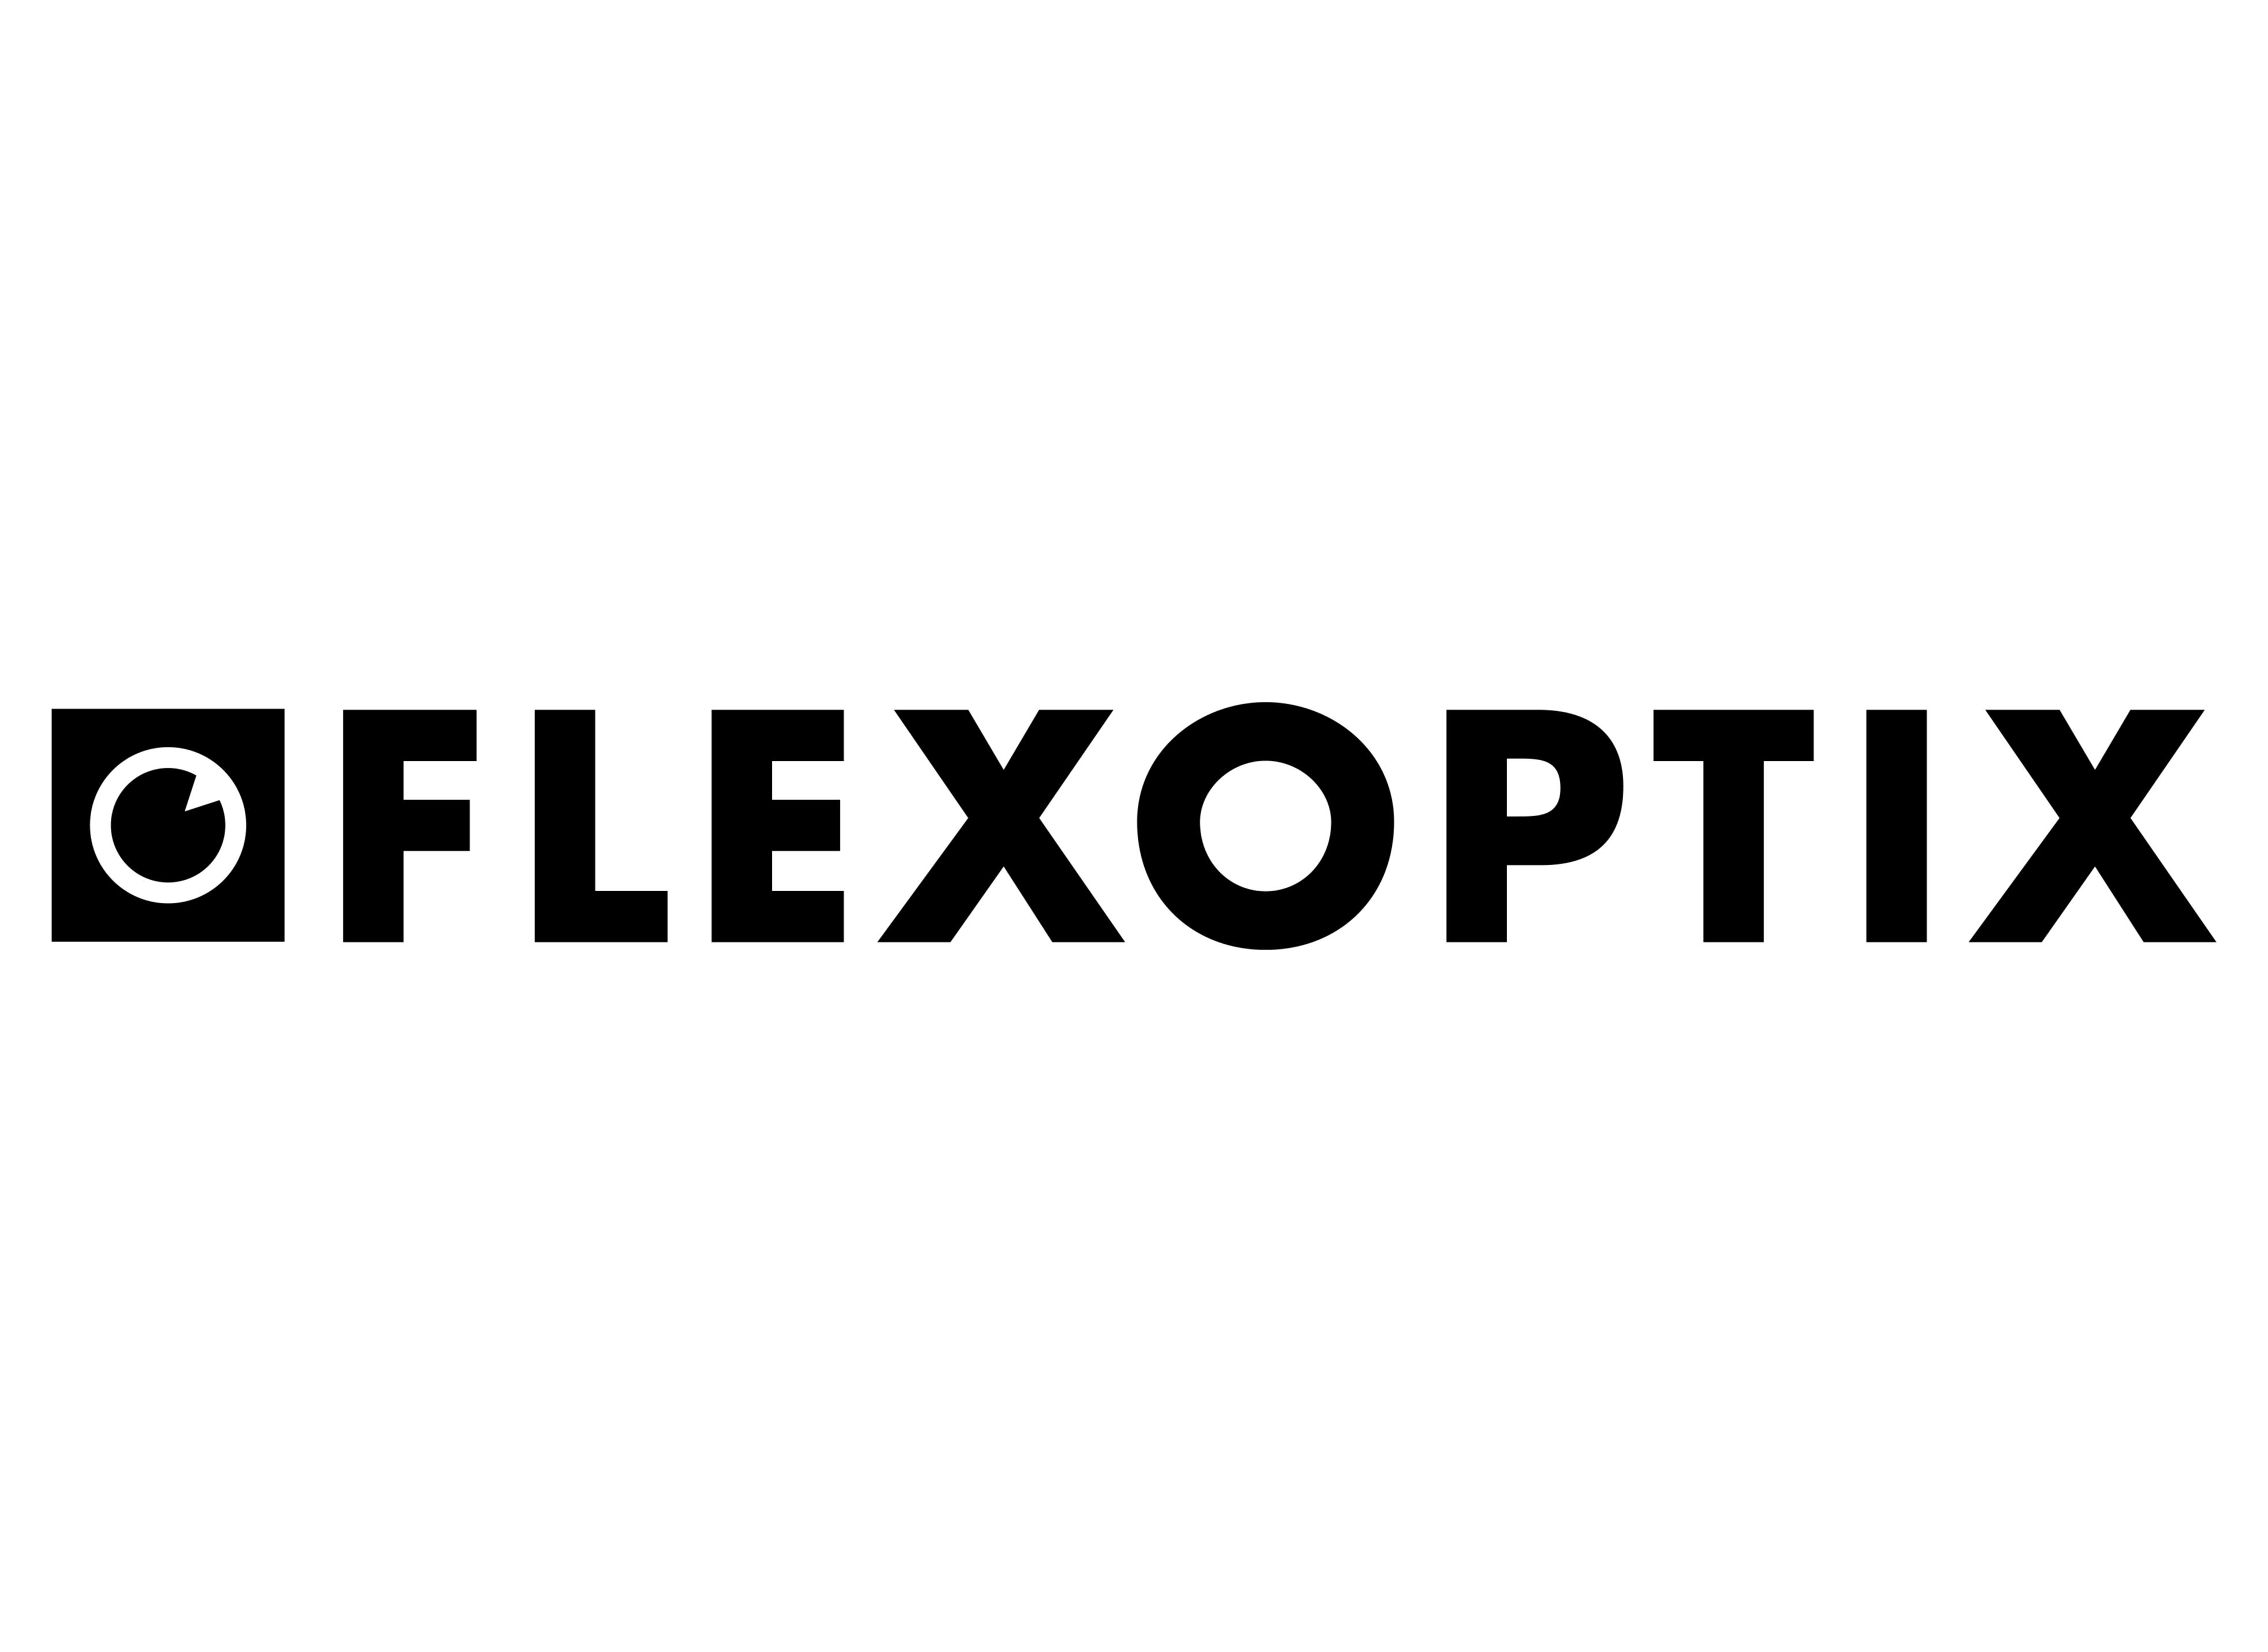 Flexoptic